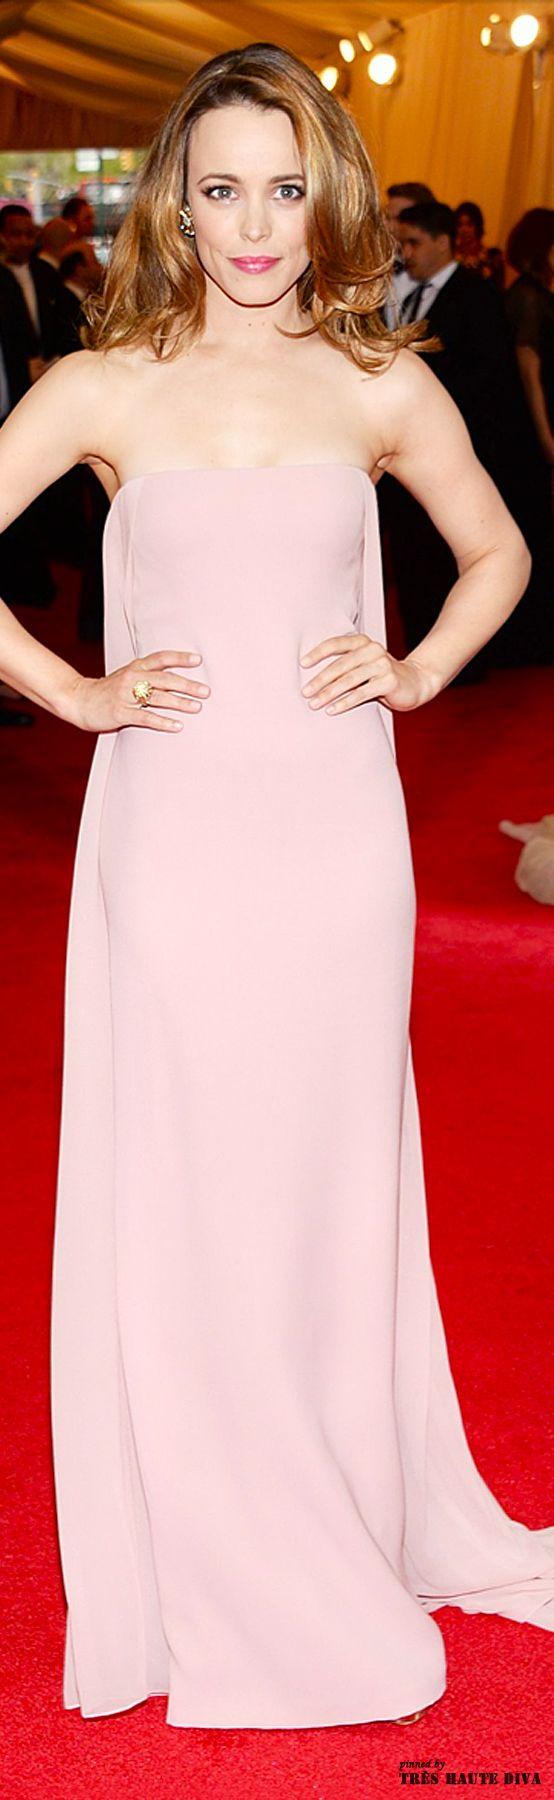 Rachel McAdams wore a dress from the Ralph Lauren Autumn /Winter 2014 collection to the Met Gala 2014